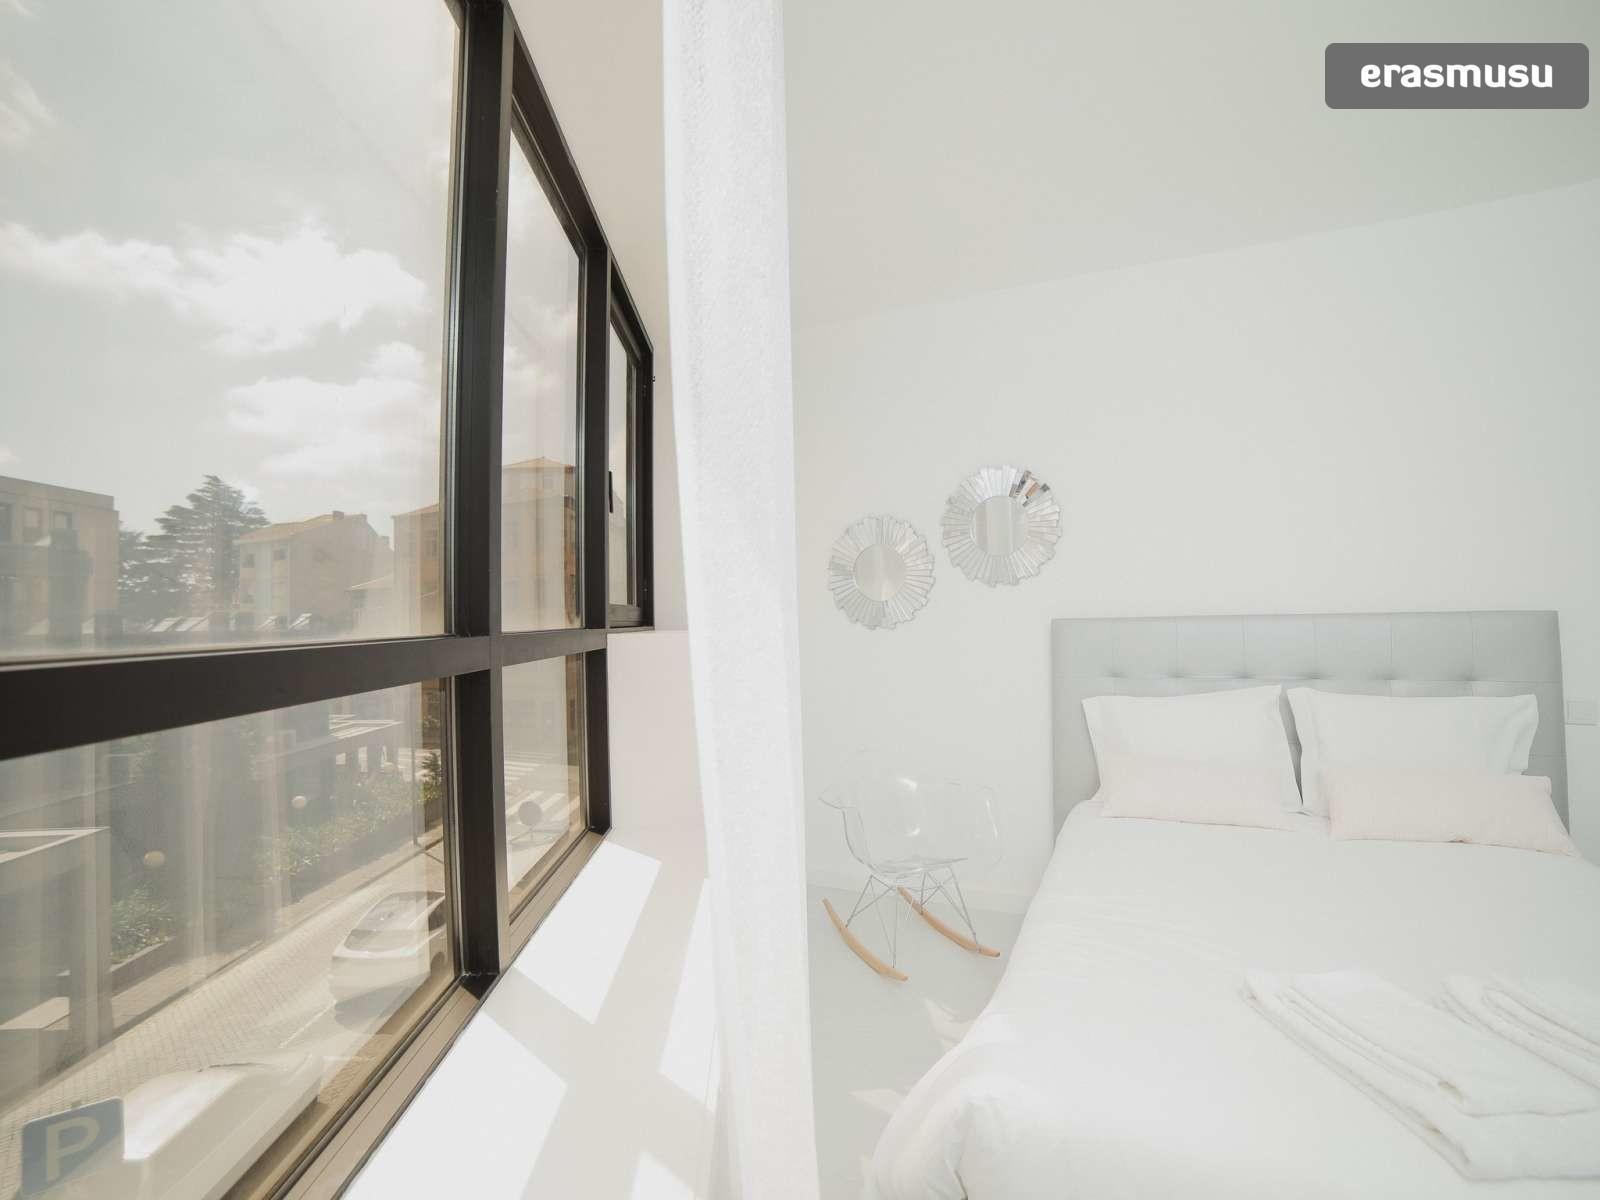 bright-studio-rent-santo-ildefonso-porto-413623644af9812229f9bcc